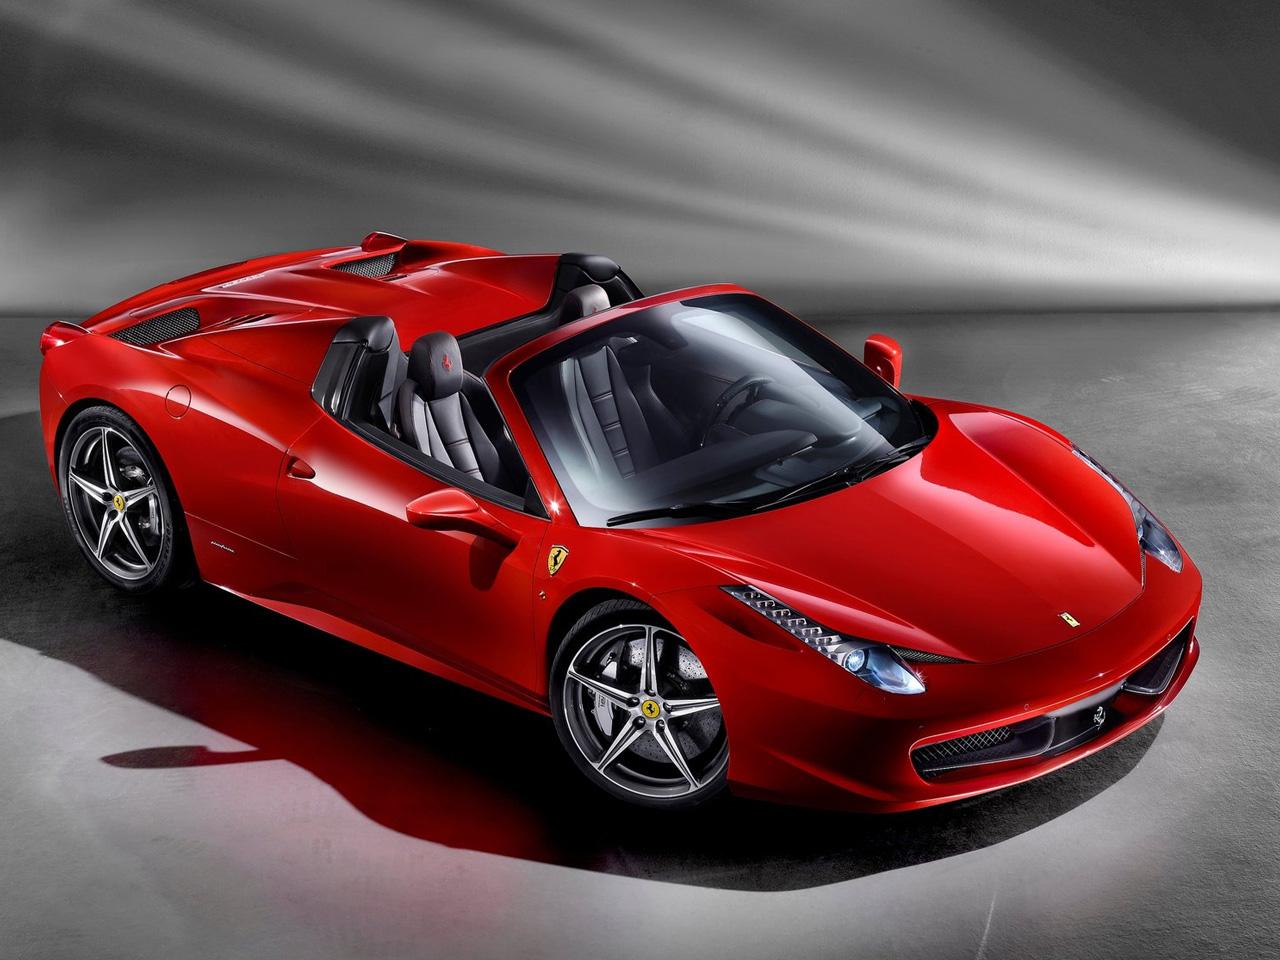 Wallpaper Mobil Sport Modifikasi - Ferrari 458 Spider , HD Wallpaper & Backgrounds